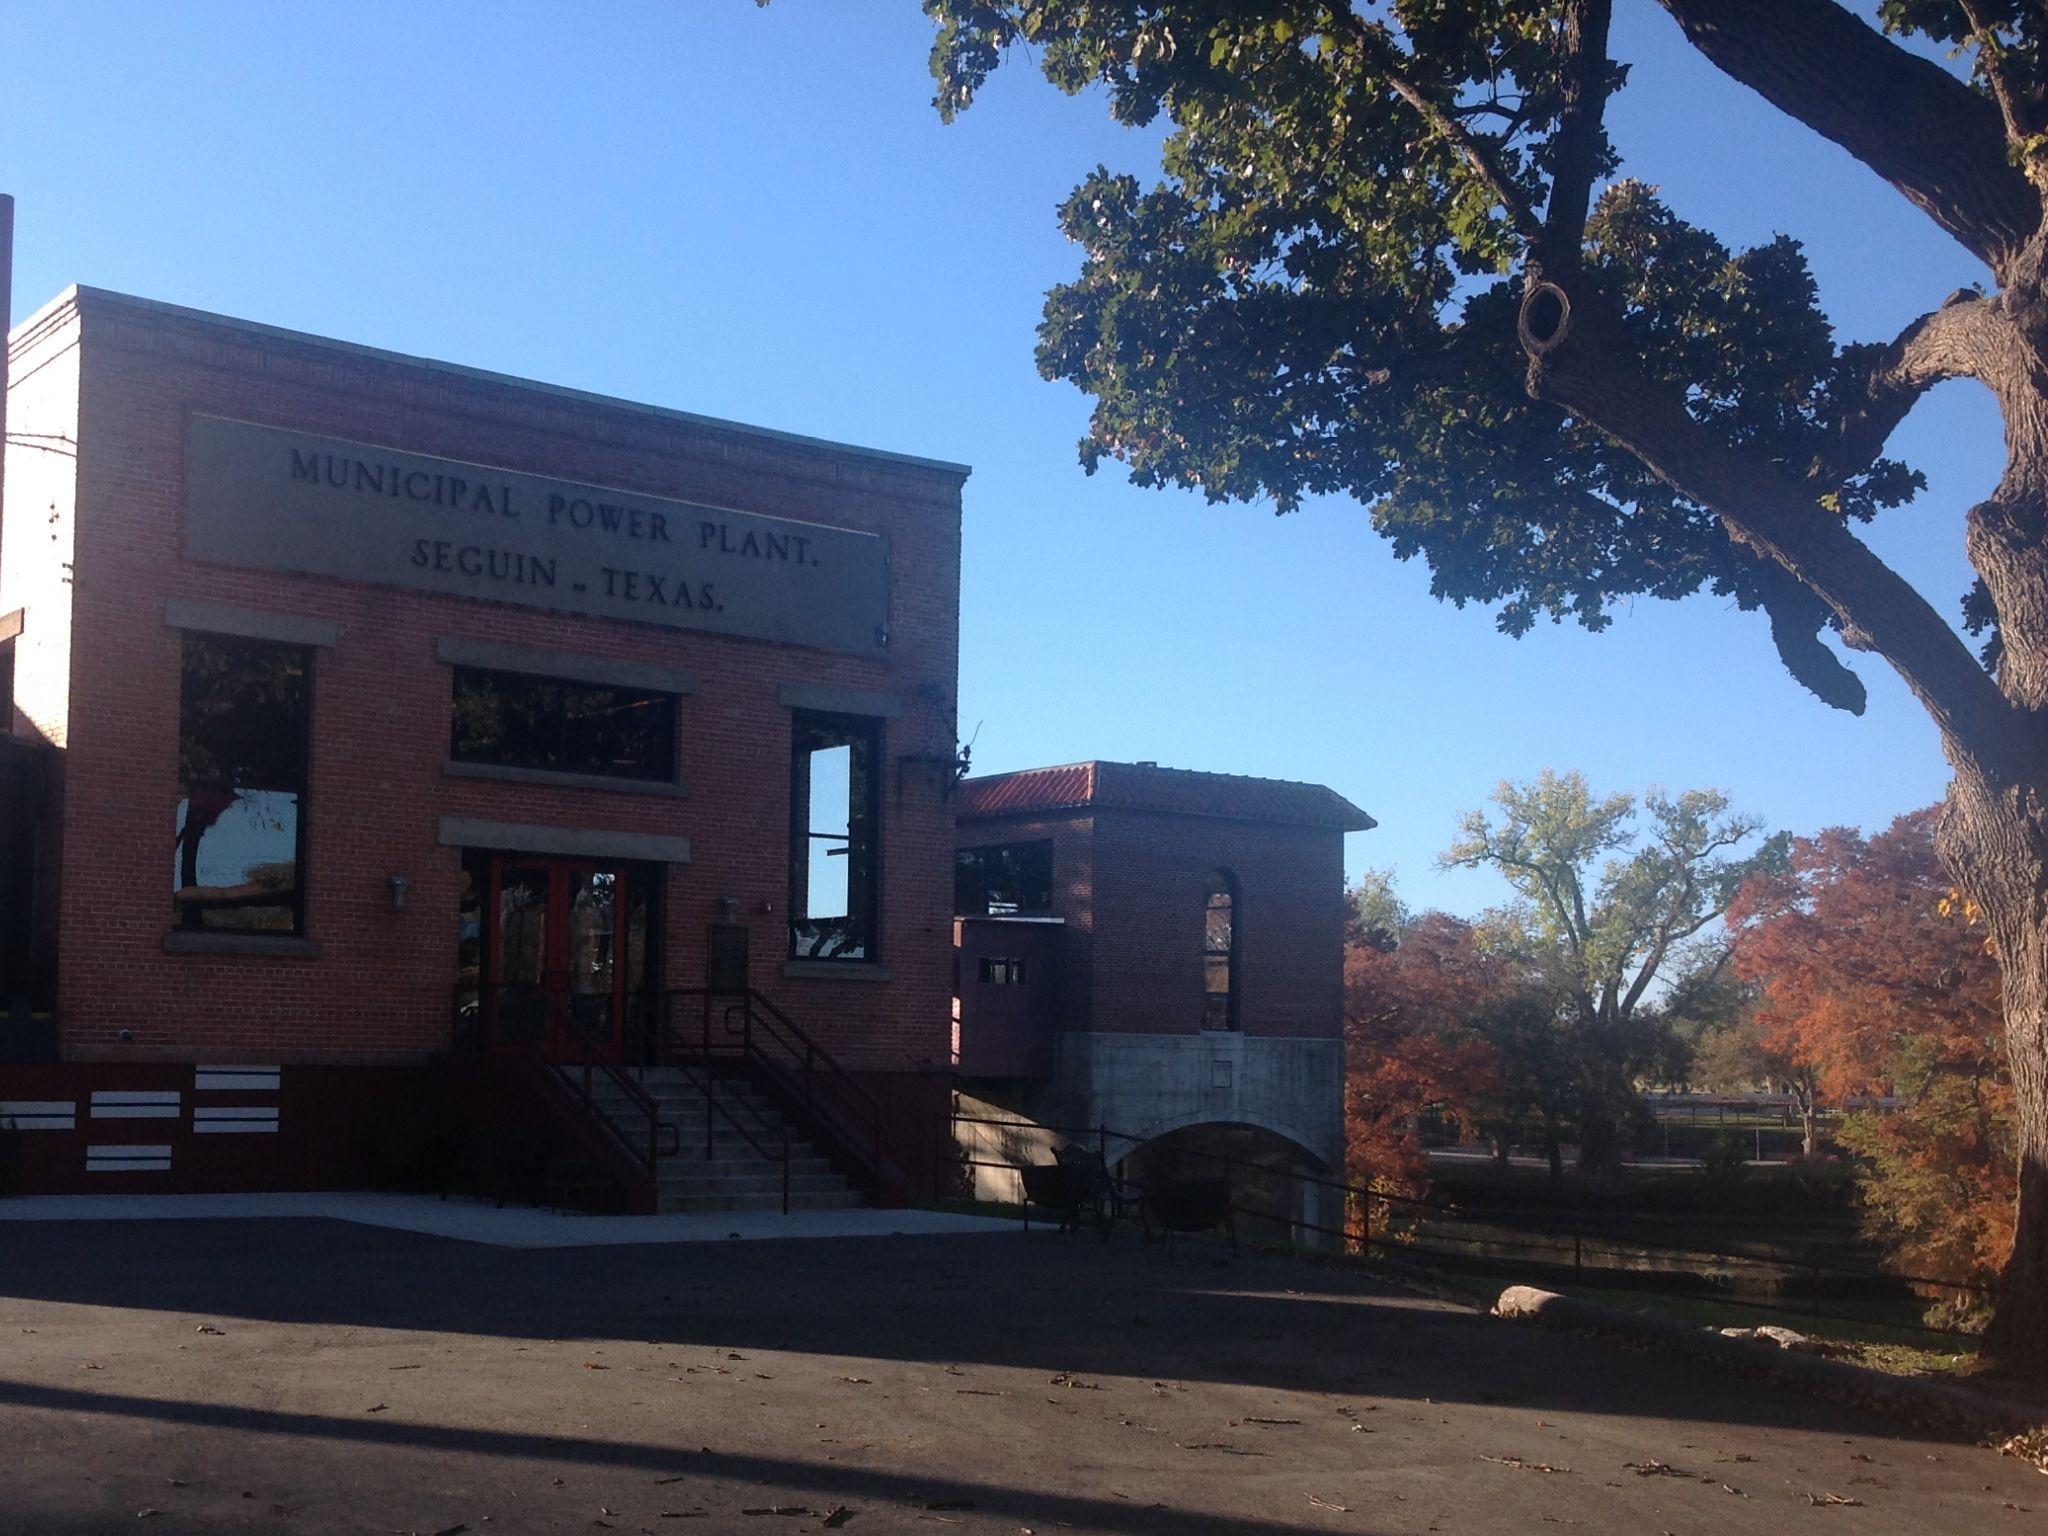 Power Plant Restaurant Seguin Texas Texas Pinterest Texas